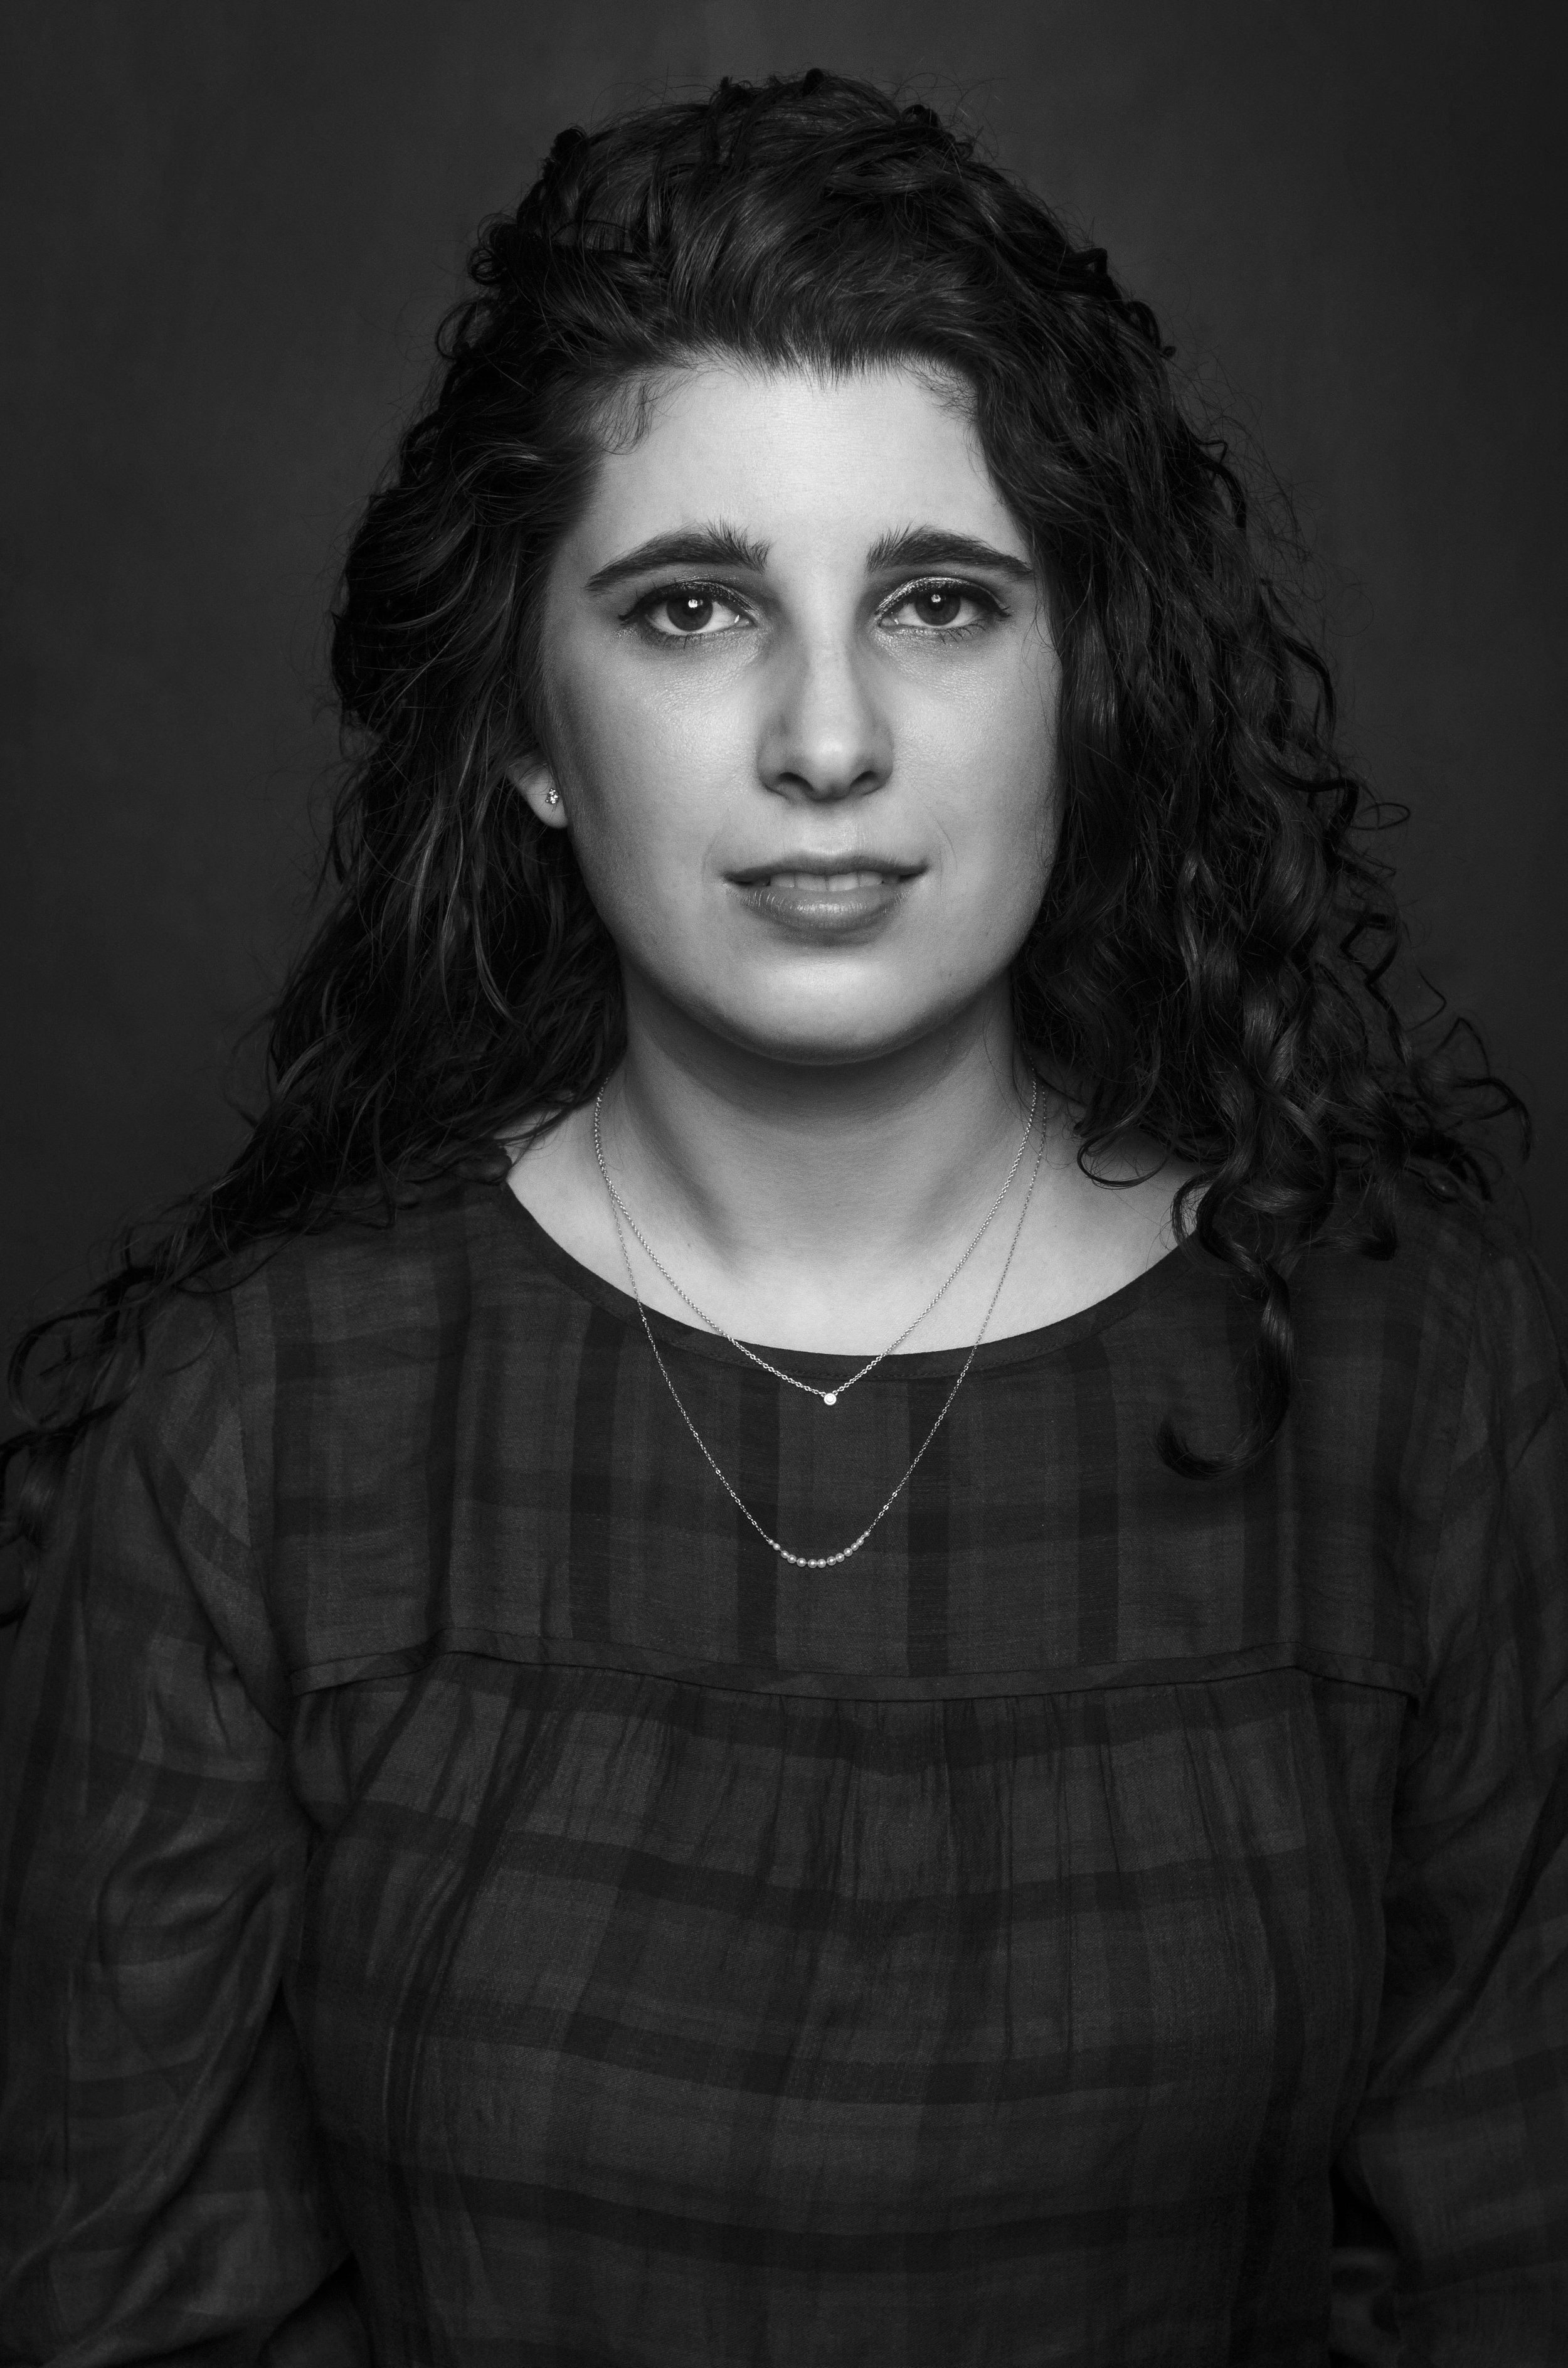 The Face of the Story-Elizabeth Merrill.jpg